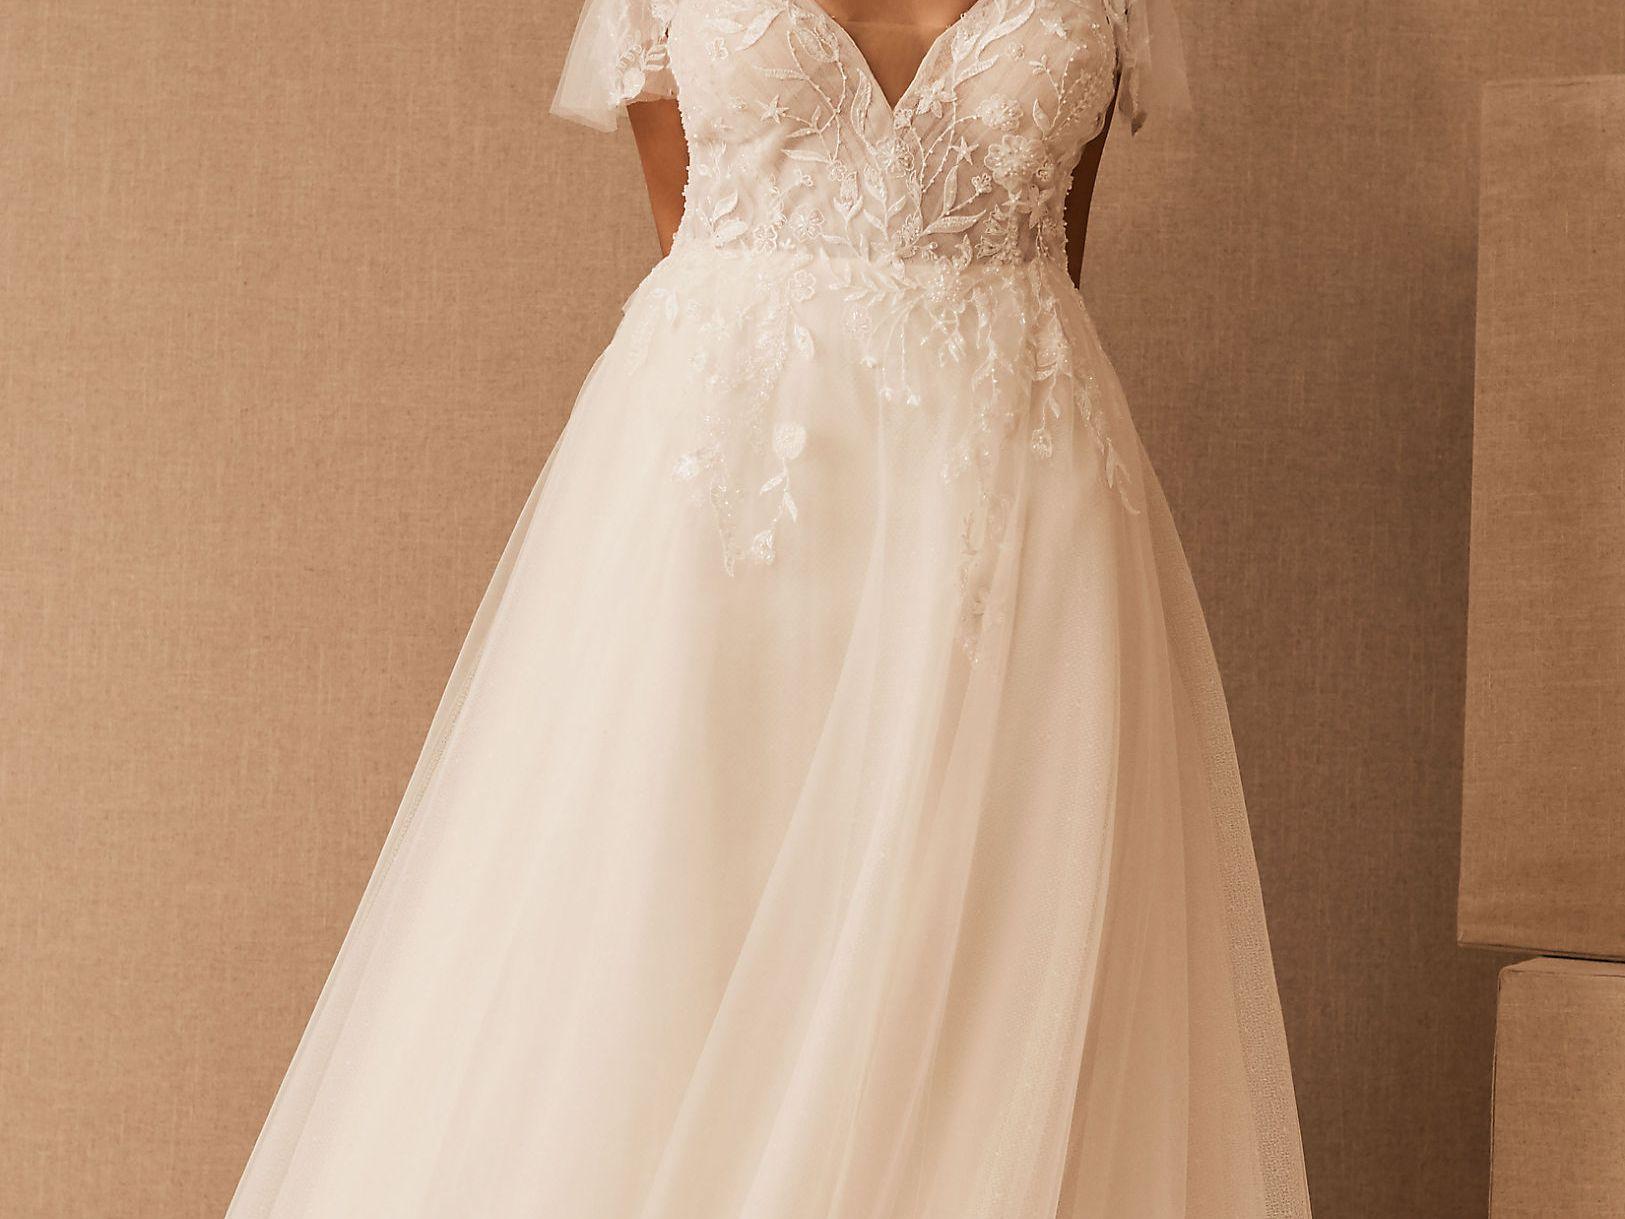 18 Best Plus Size Wedding Dresses of 1821